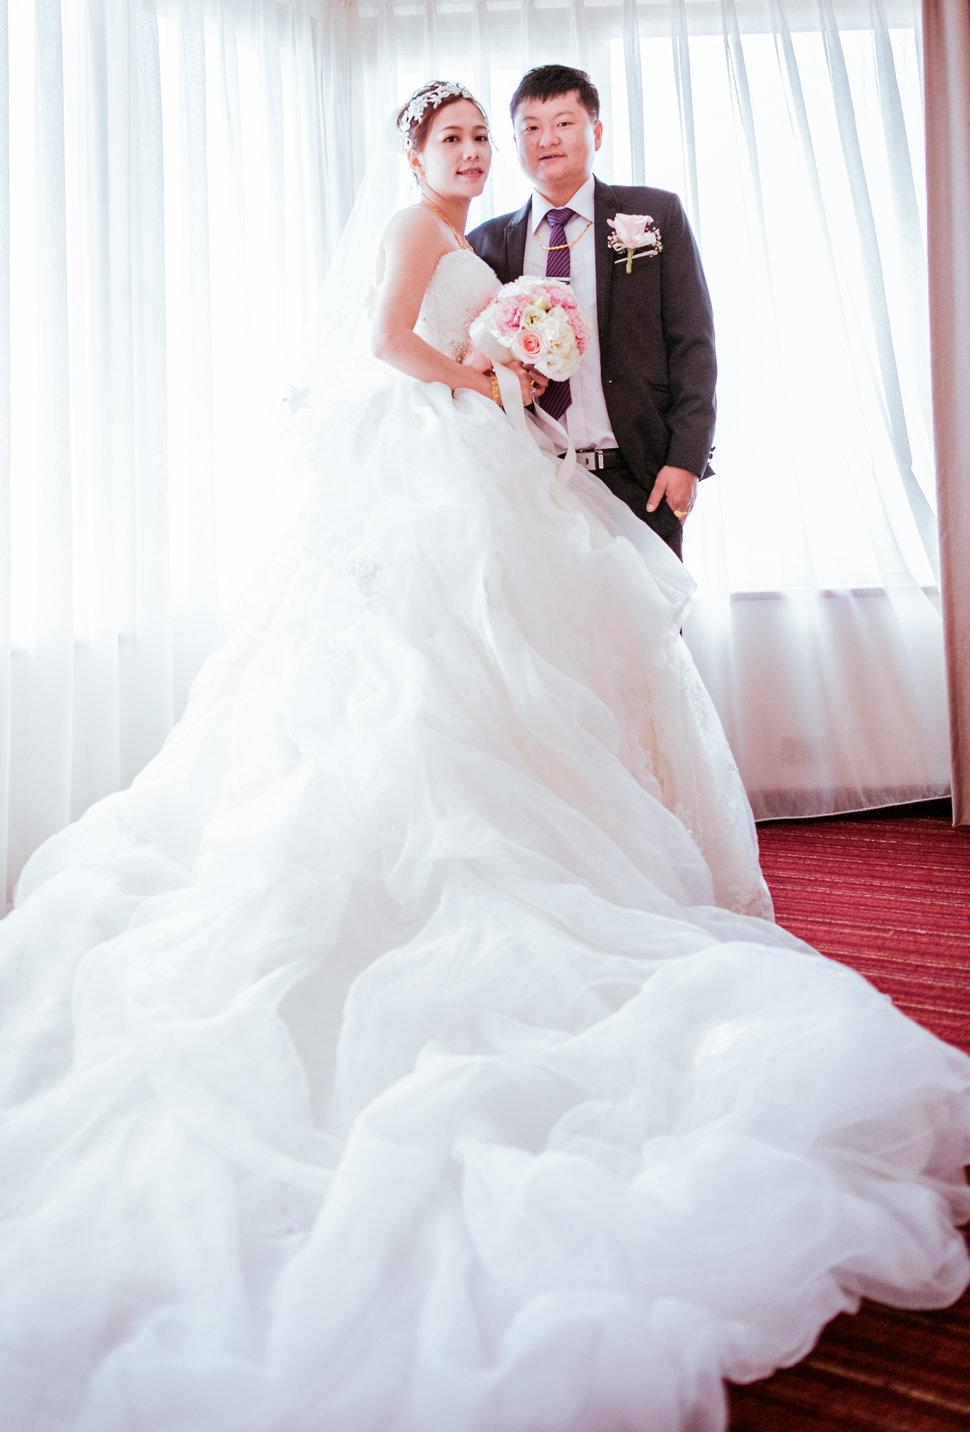 YF2A0548 - Yusin 攝影~與您同心祝福您永結同心 - 結婚吧